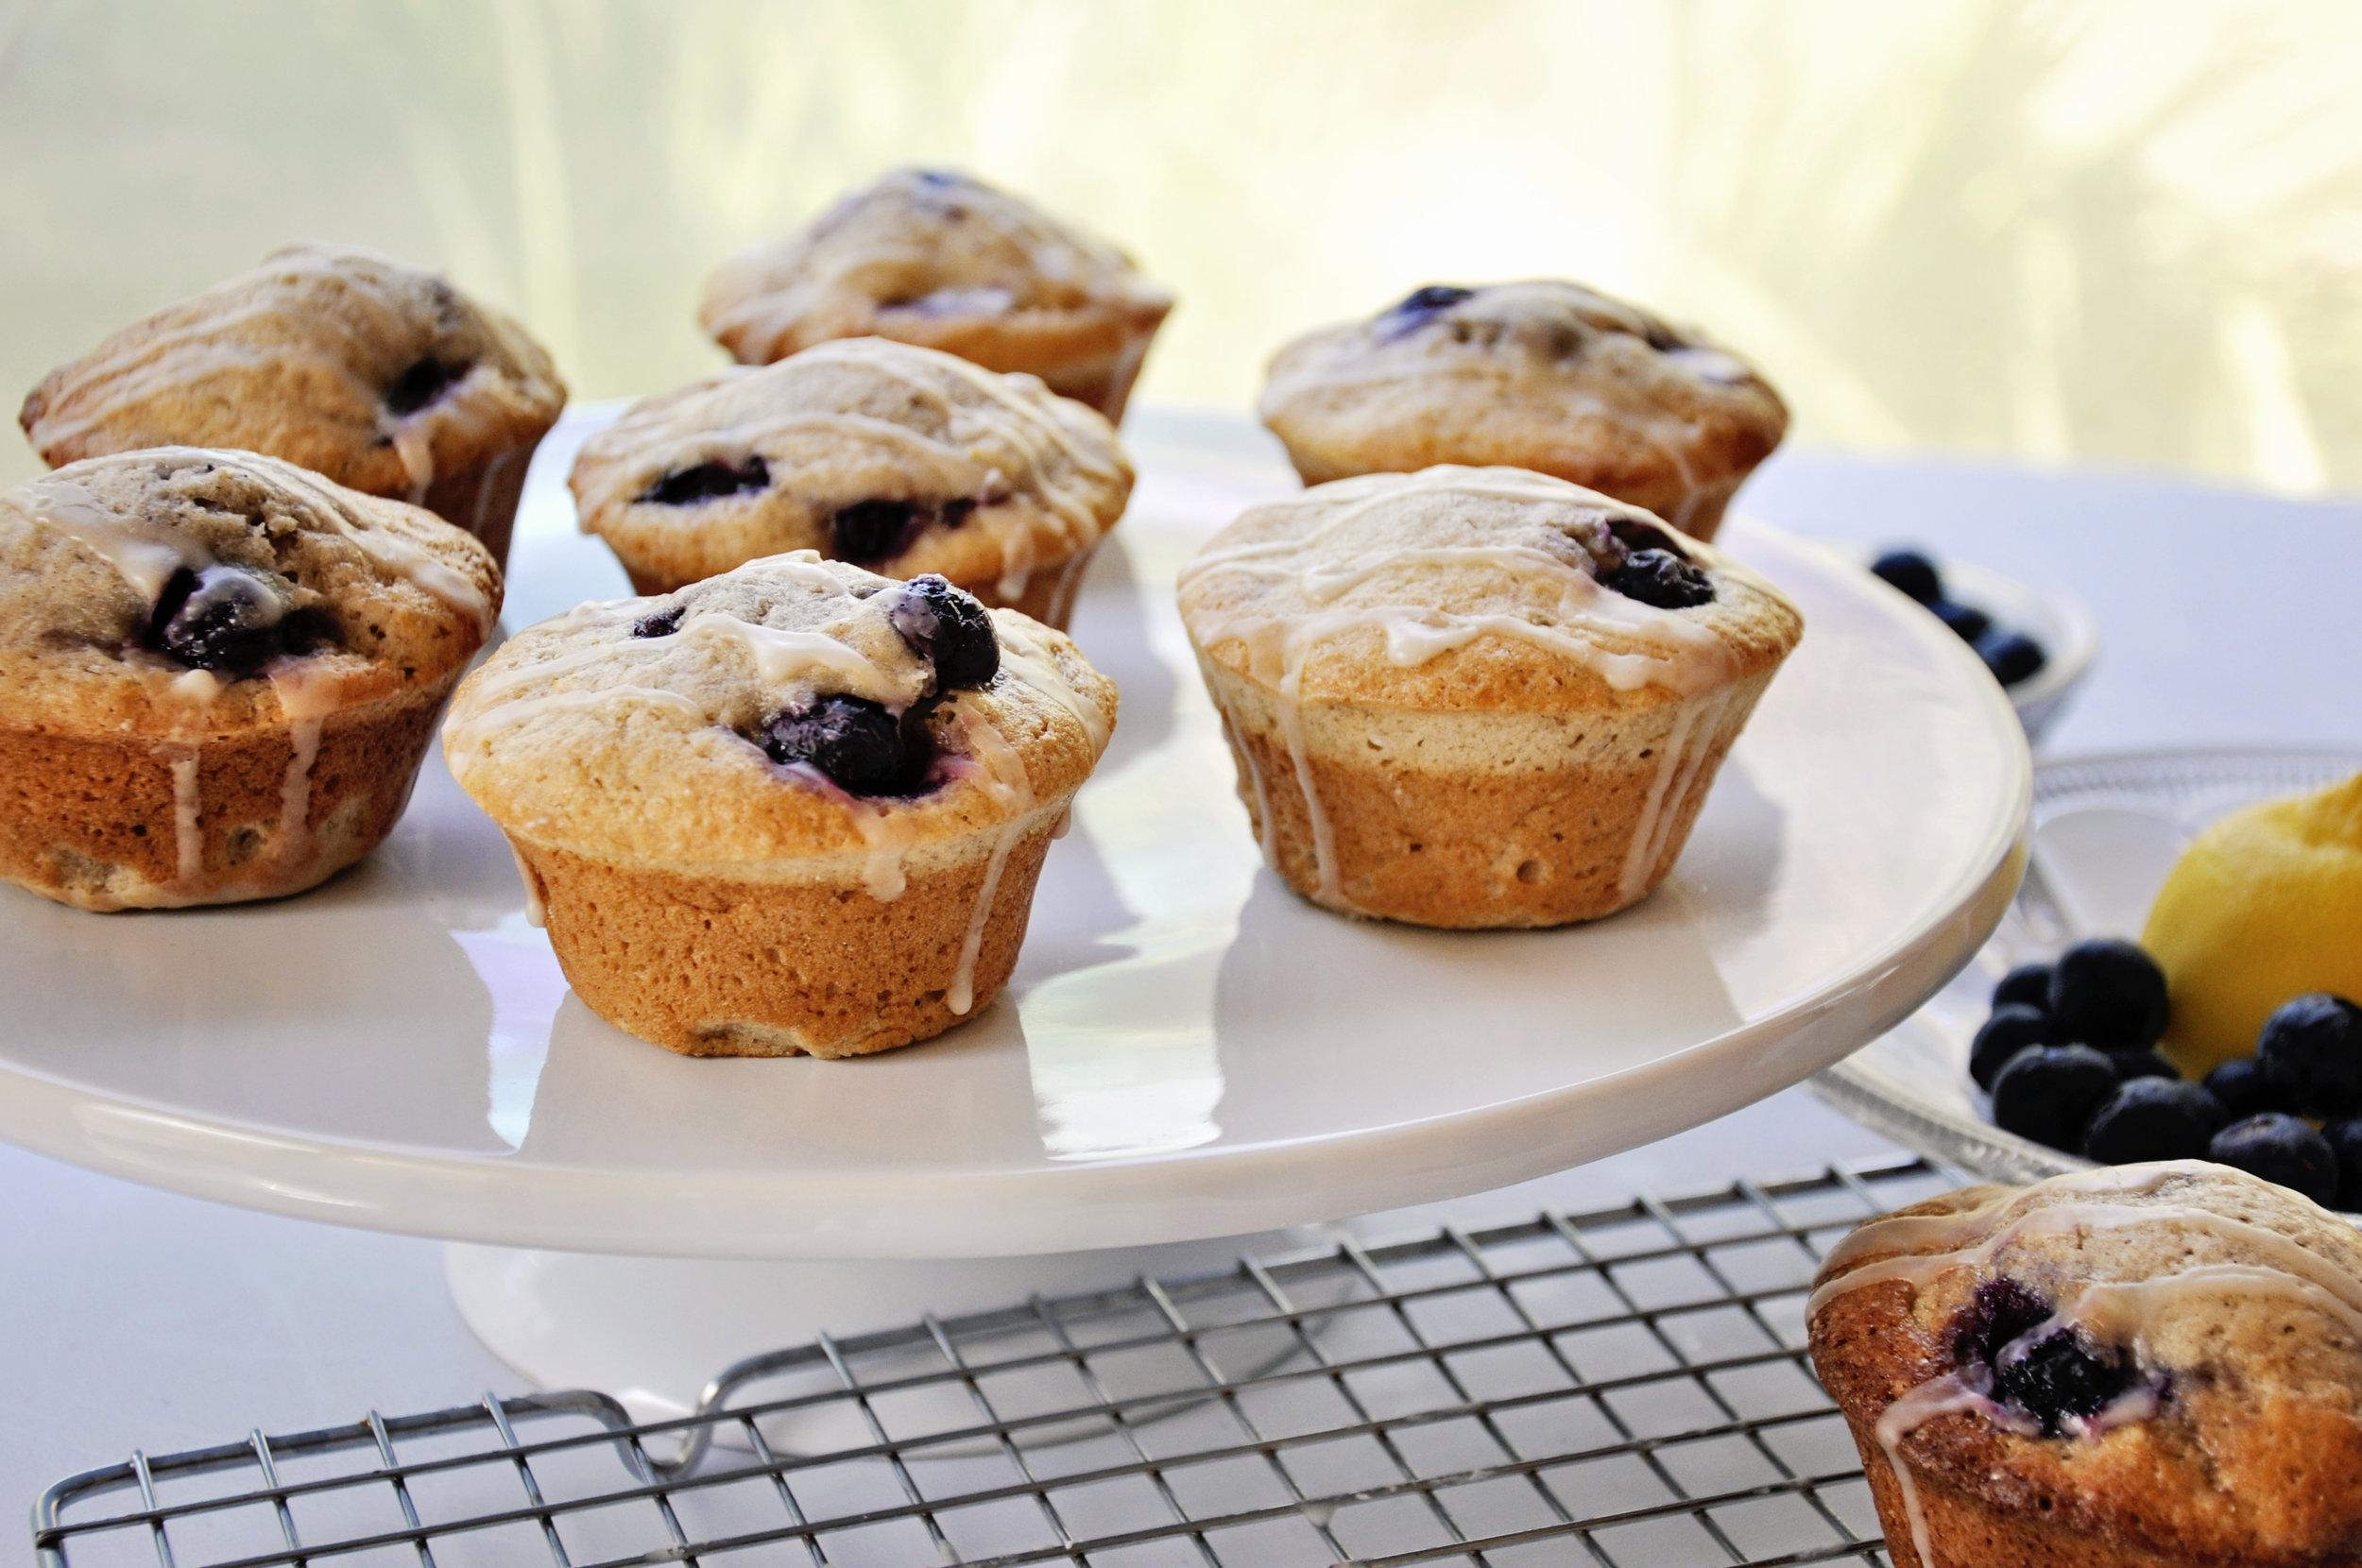 BlueBerry Muffin GigiWIlson.jpg